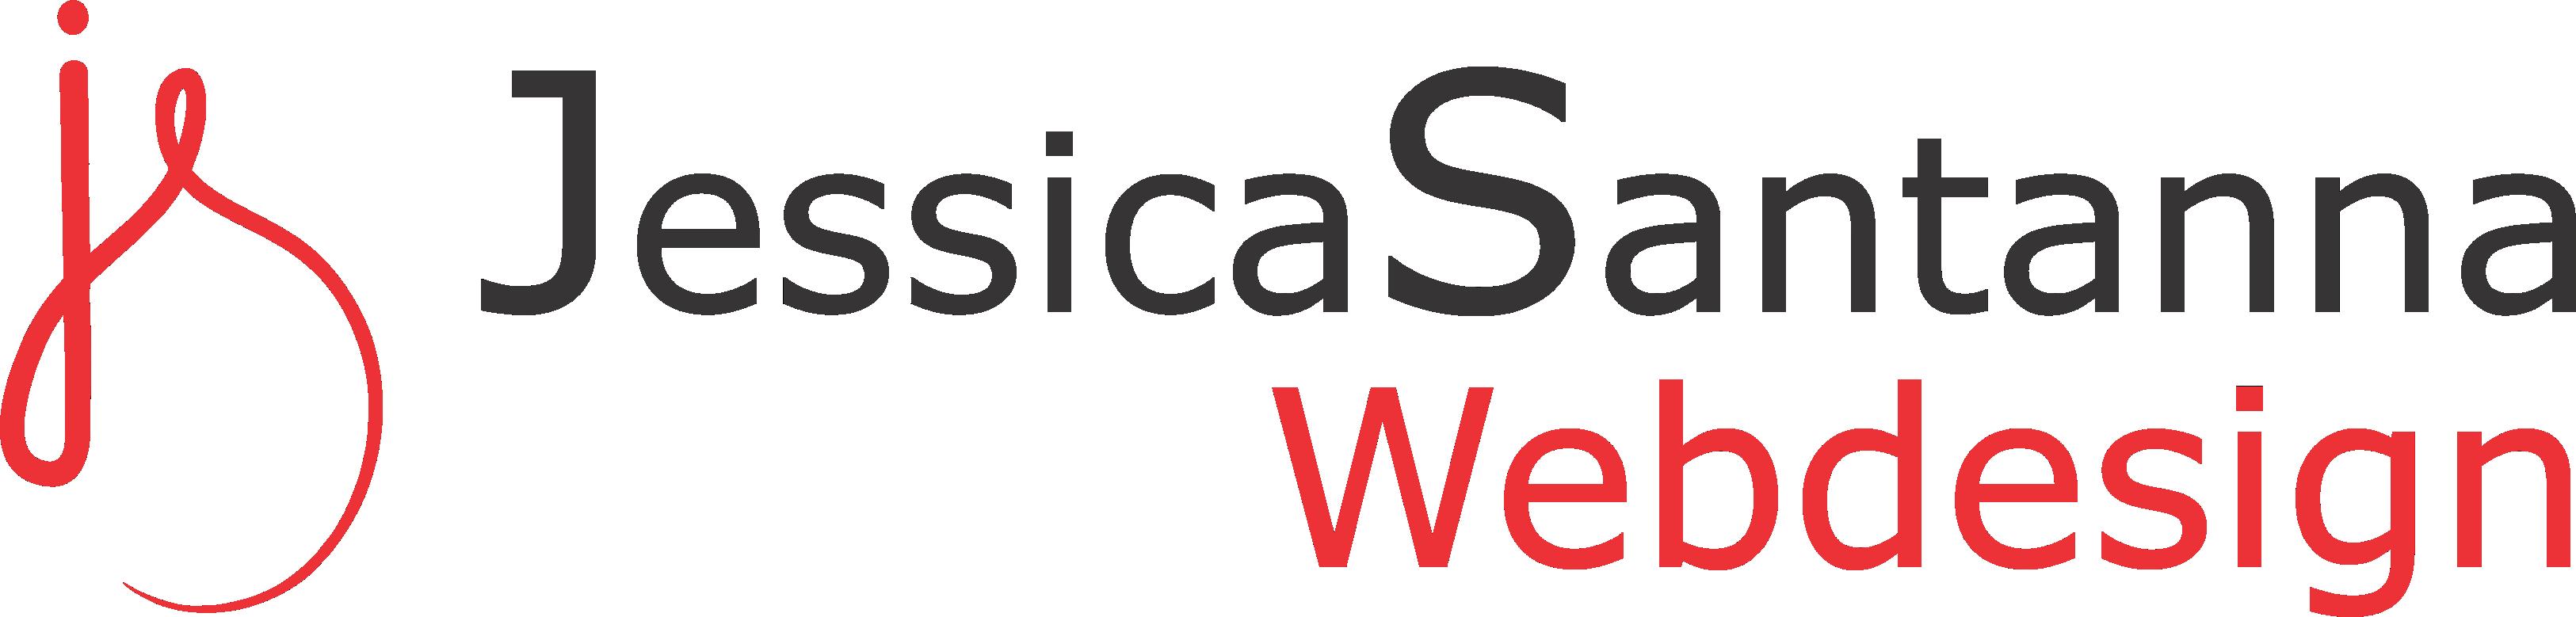 JessicaSantanna Webdesign